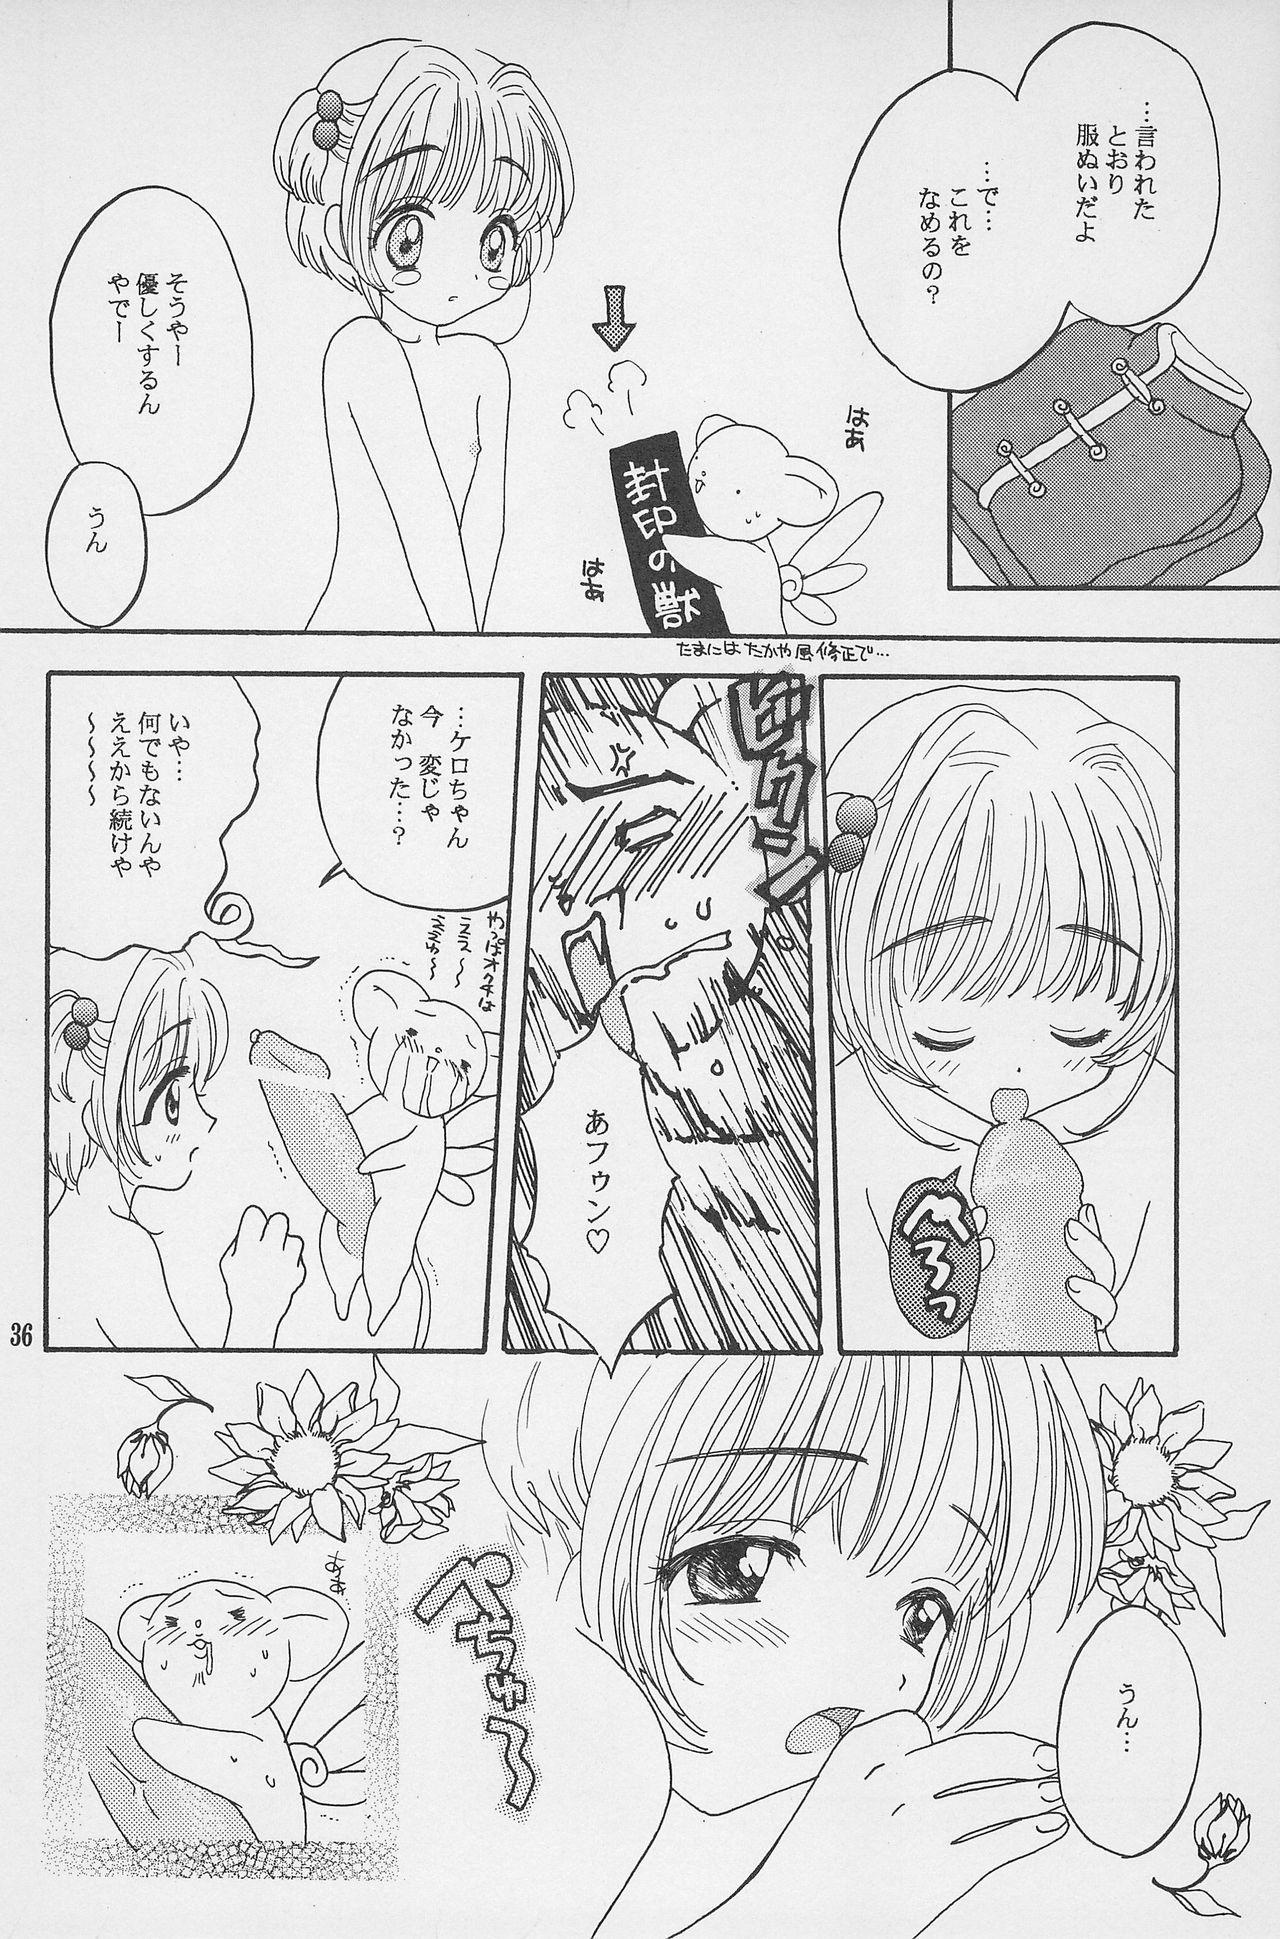 Super Loli Loli Daisakusen! 37